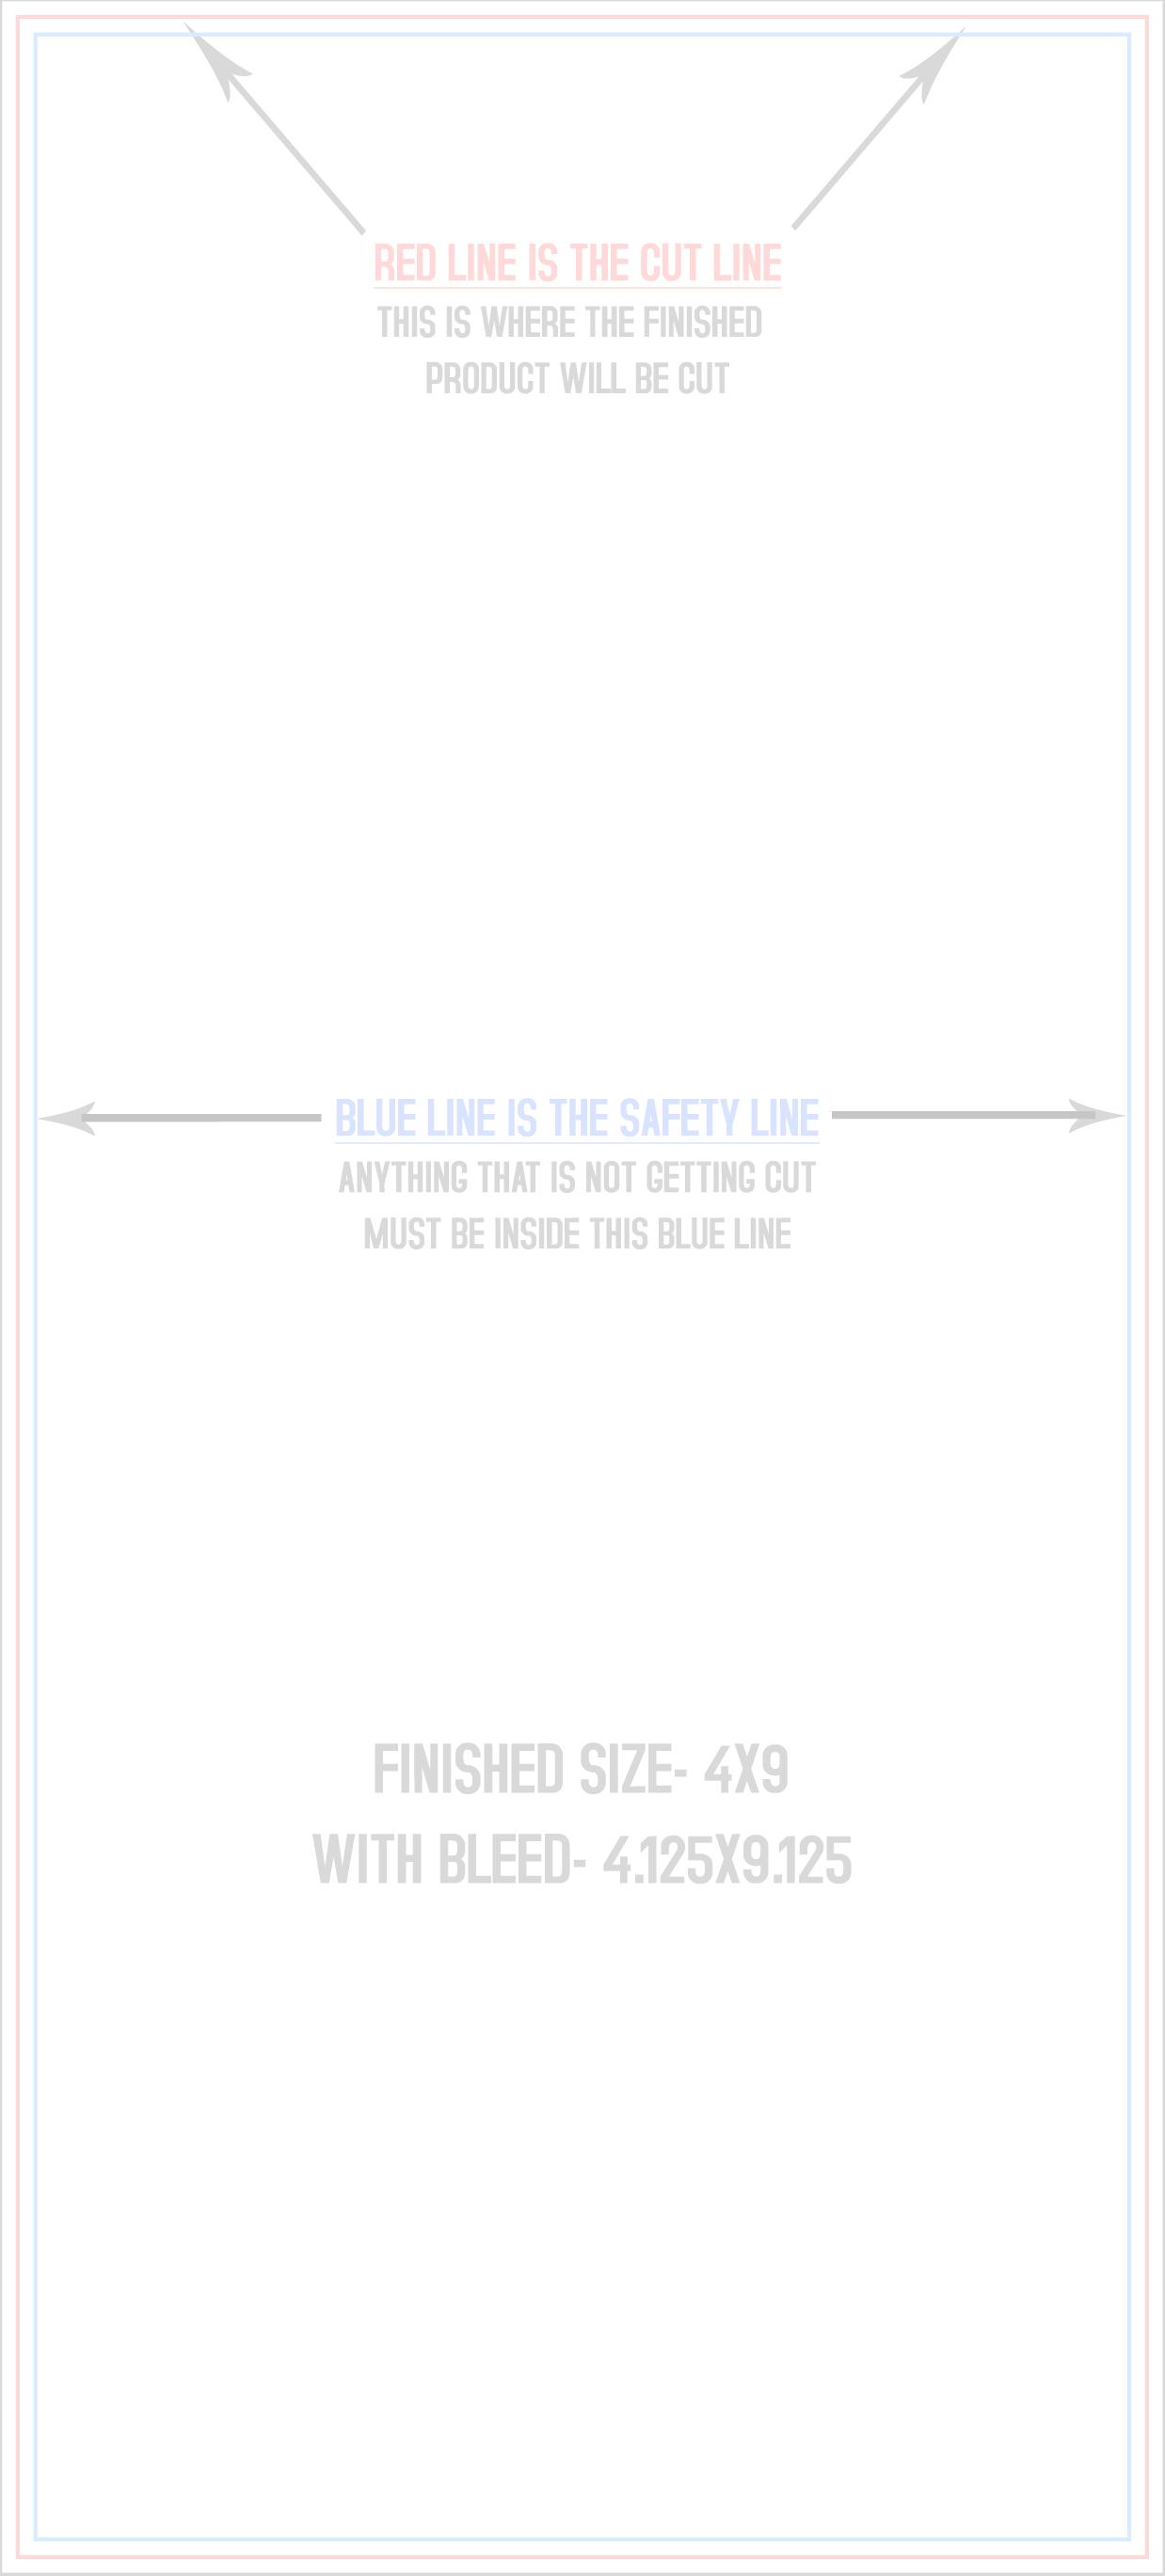 6x9 postcard template